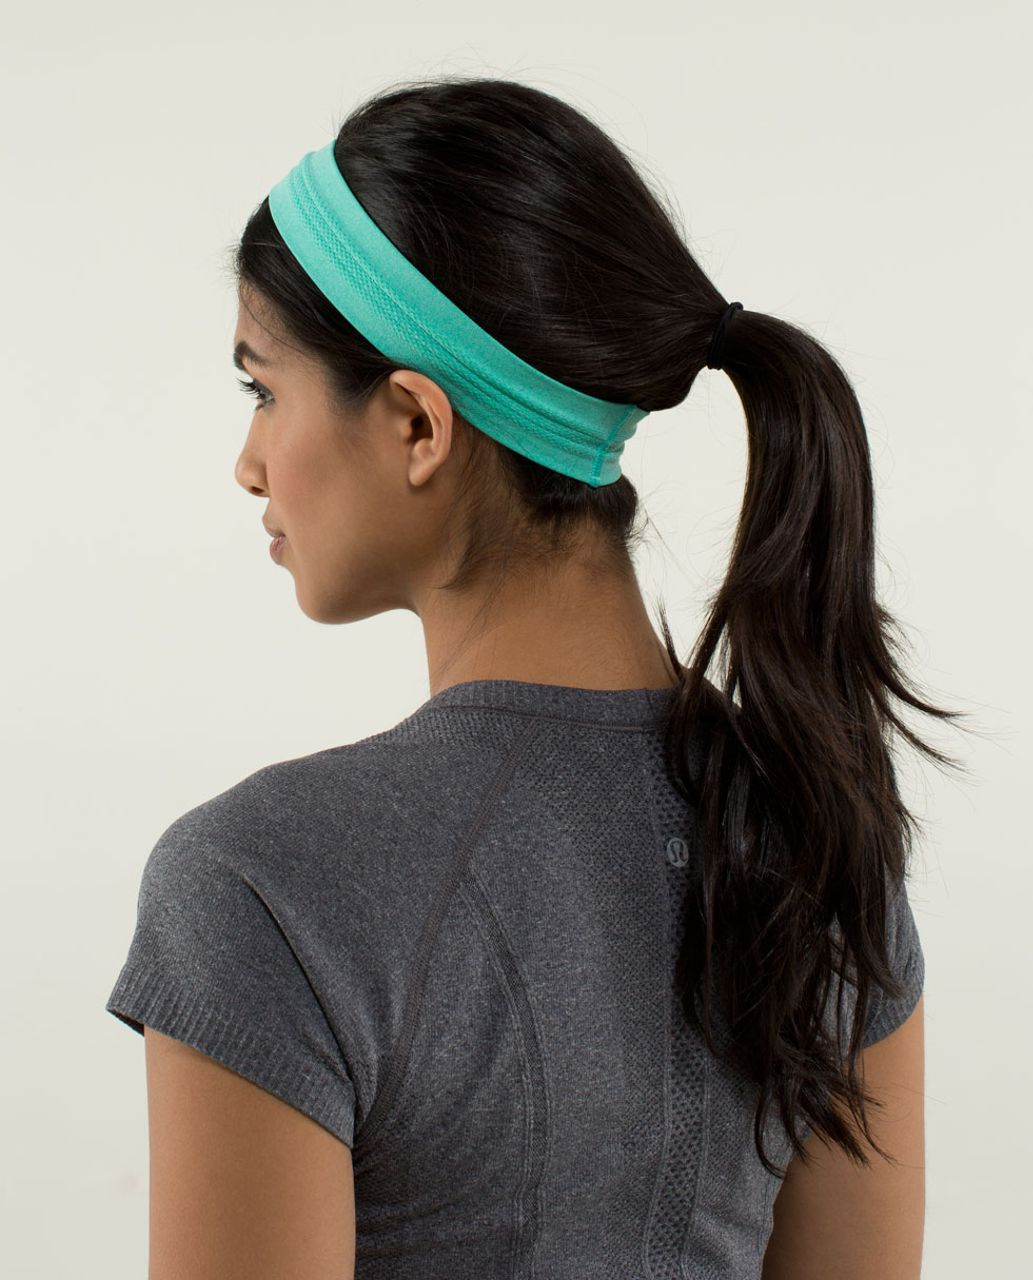 Lululemon Swiftly Headband - Heathered Bali Breeze